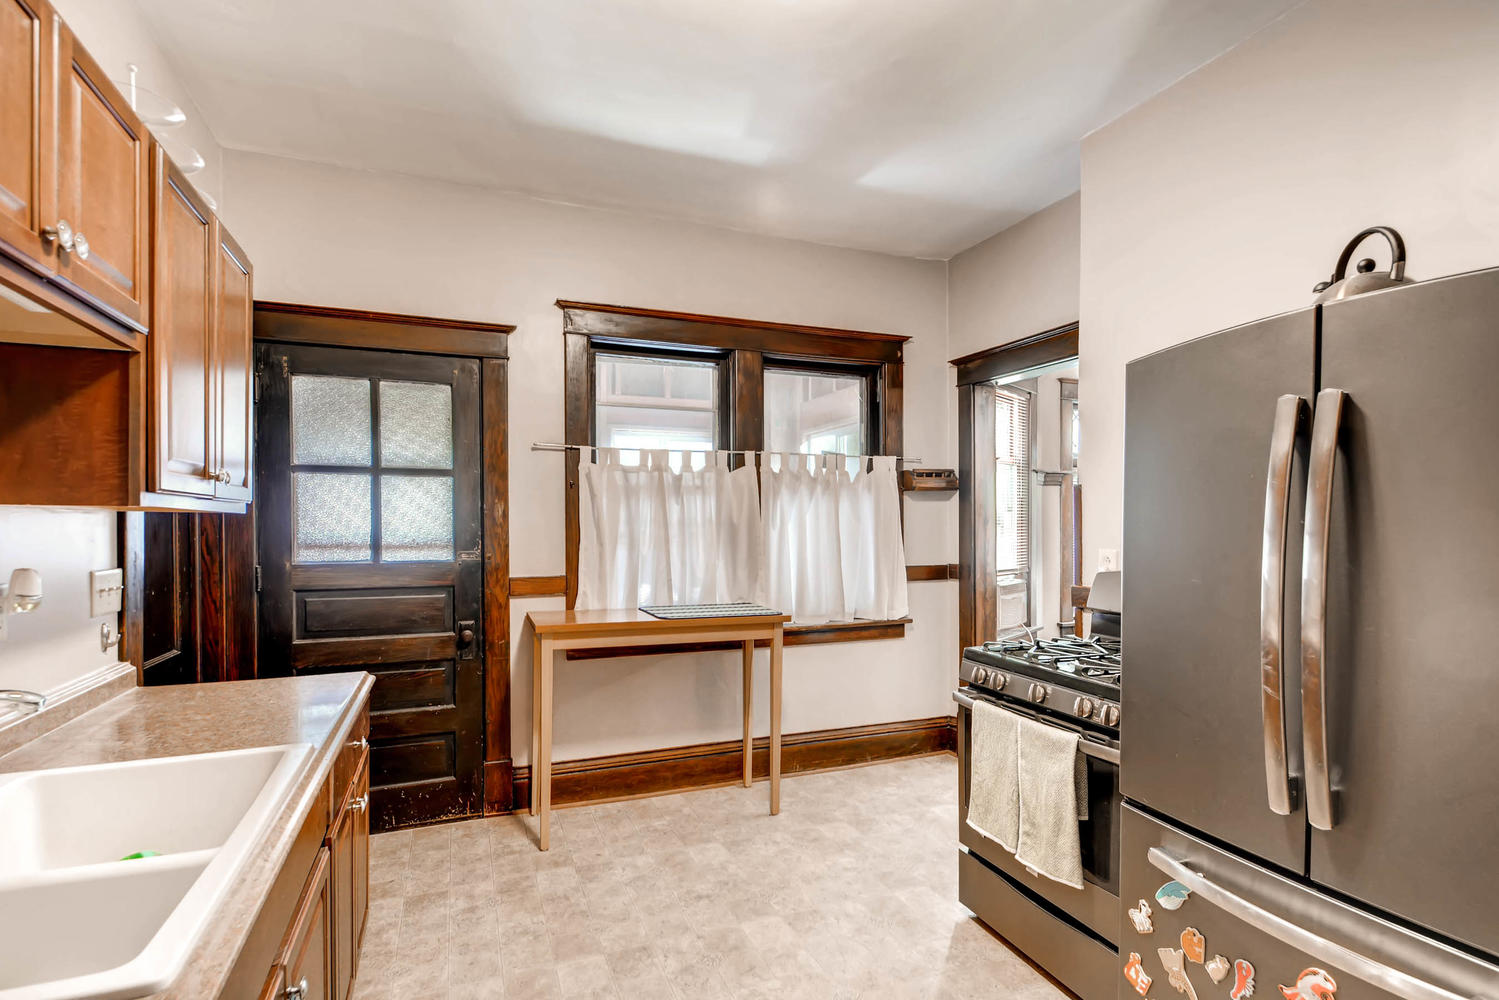 1121 Washington St NE-large-007-7-Kitchen-1500x1000-72dpi.jpg